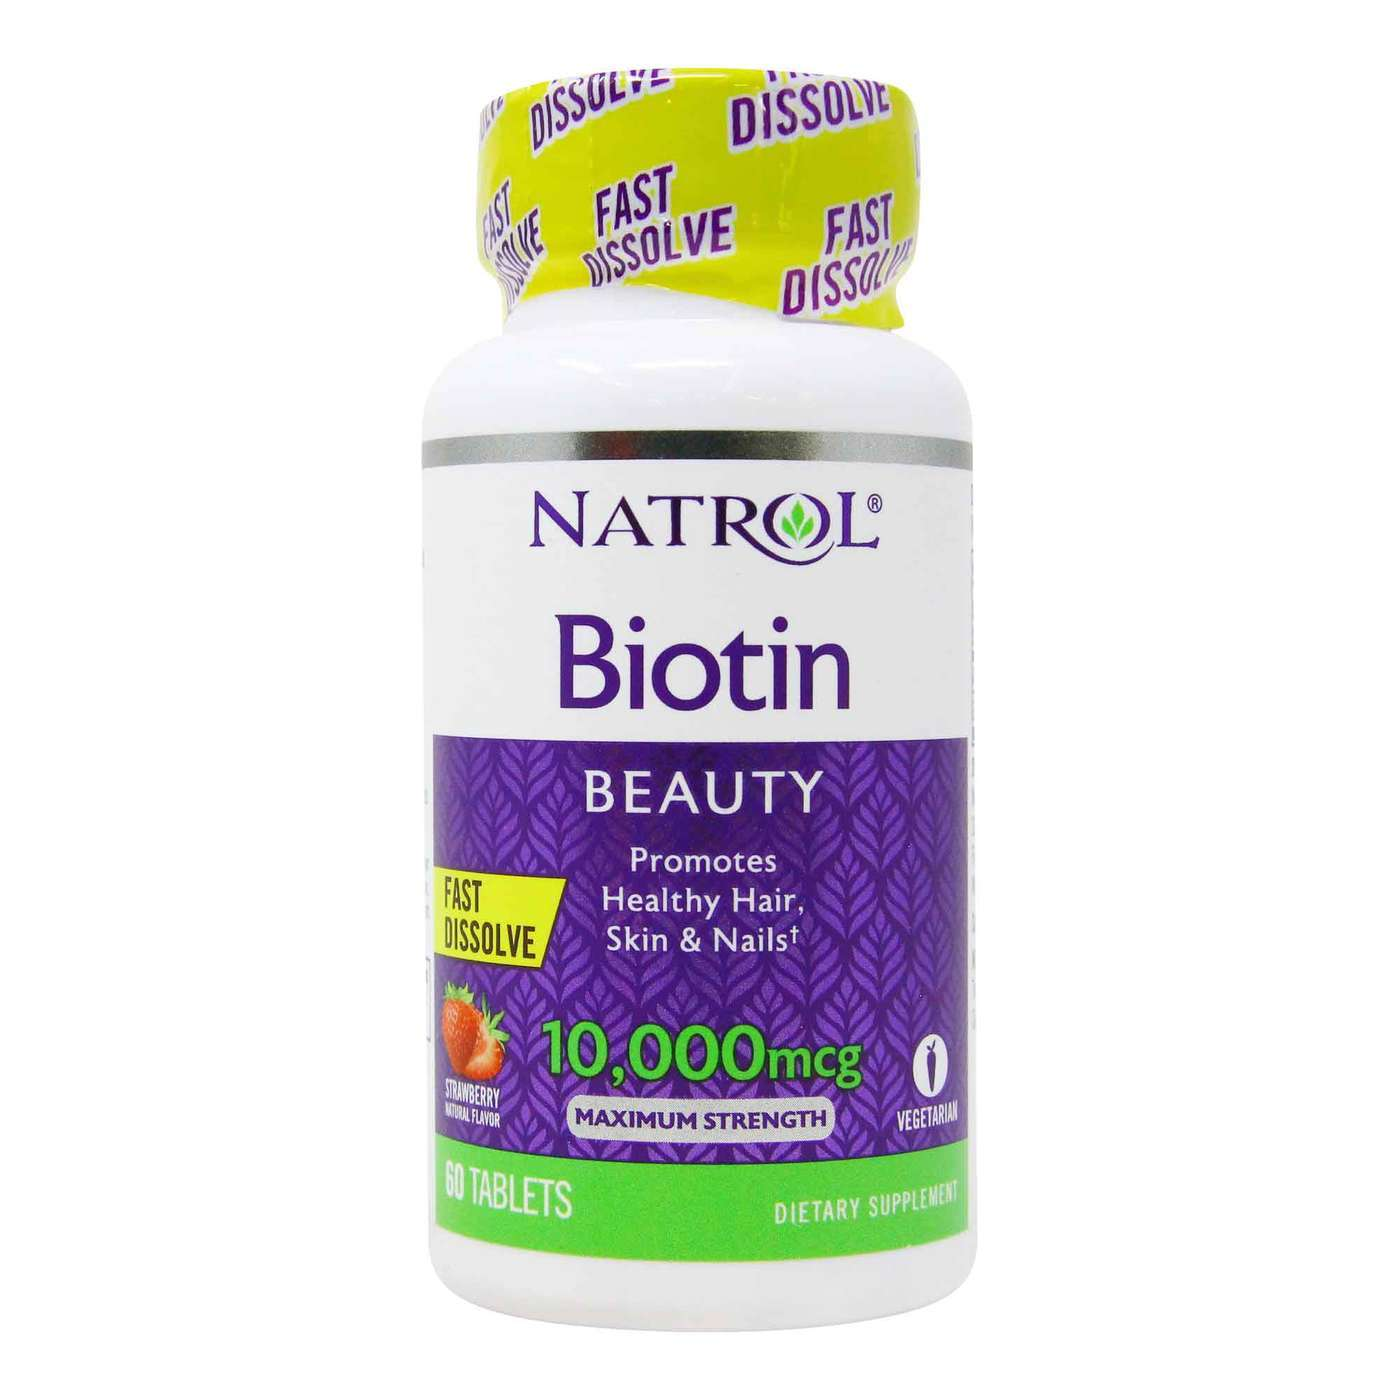 Natrol Biotina 60 Caps Morango 10.000 Mcg